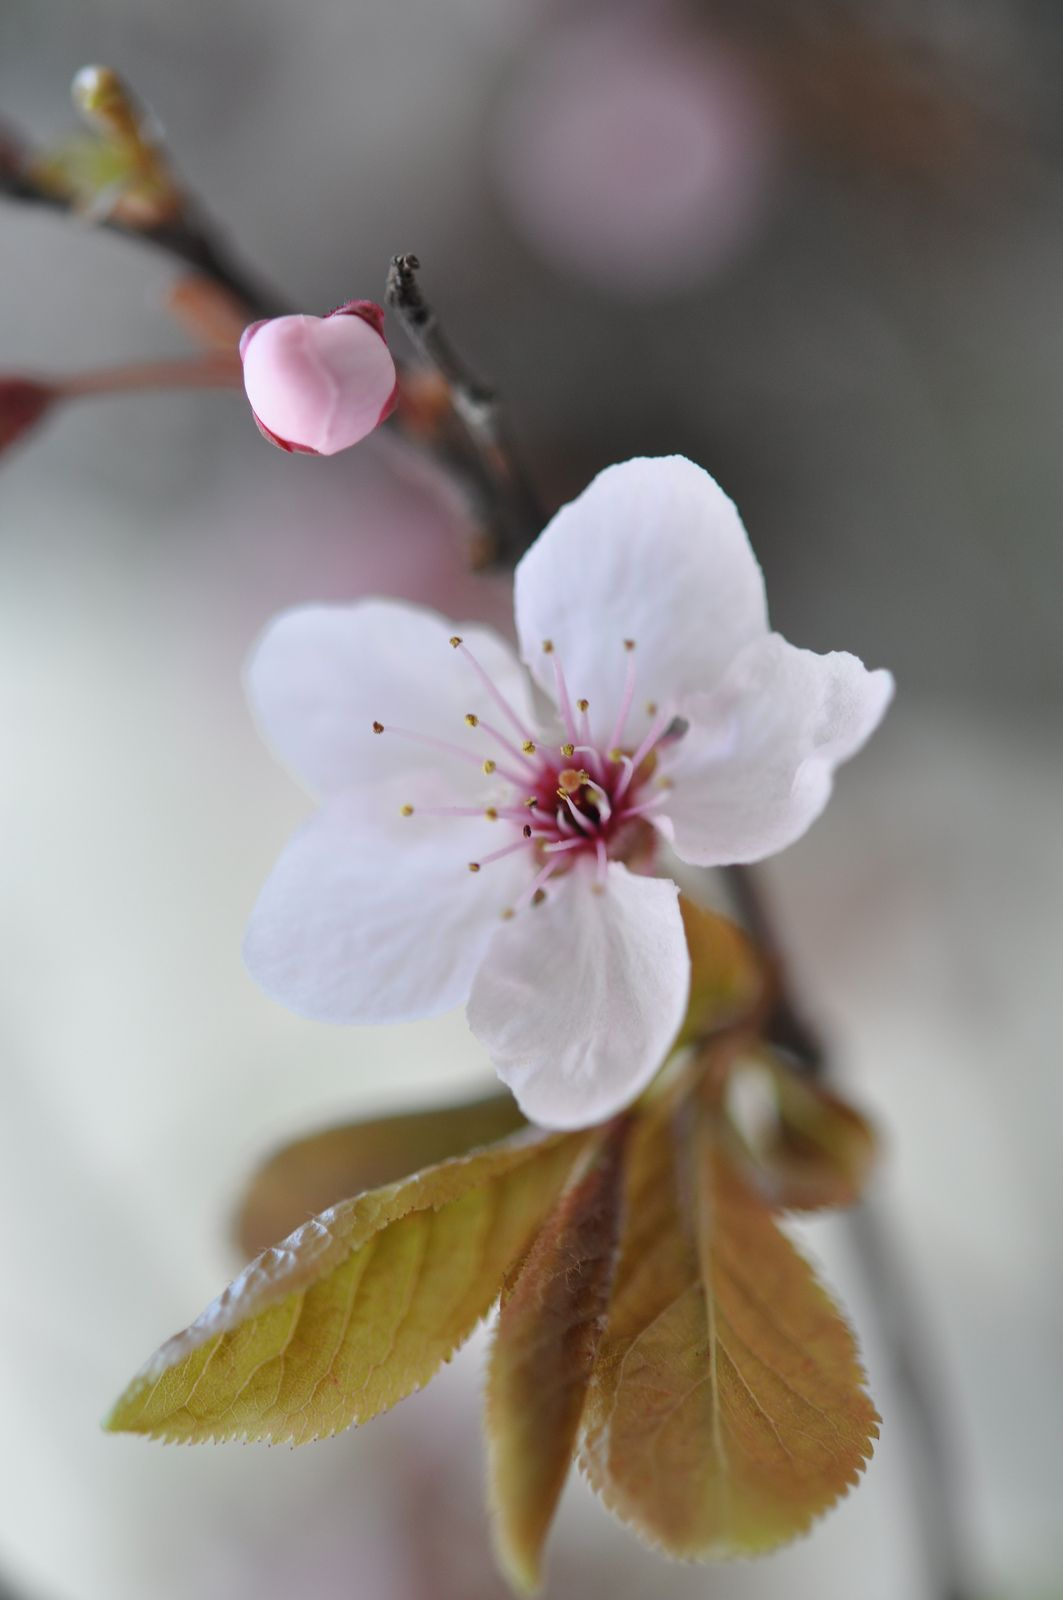 20120326 123 Cherry Blossom Flowers Blossom Flower Botanical Flowers